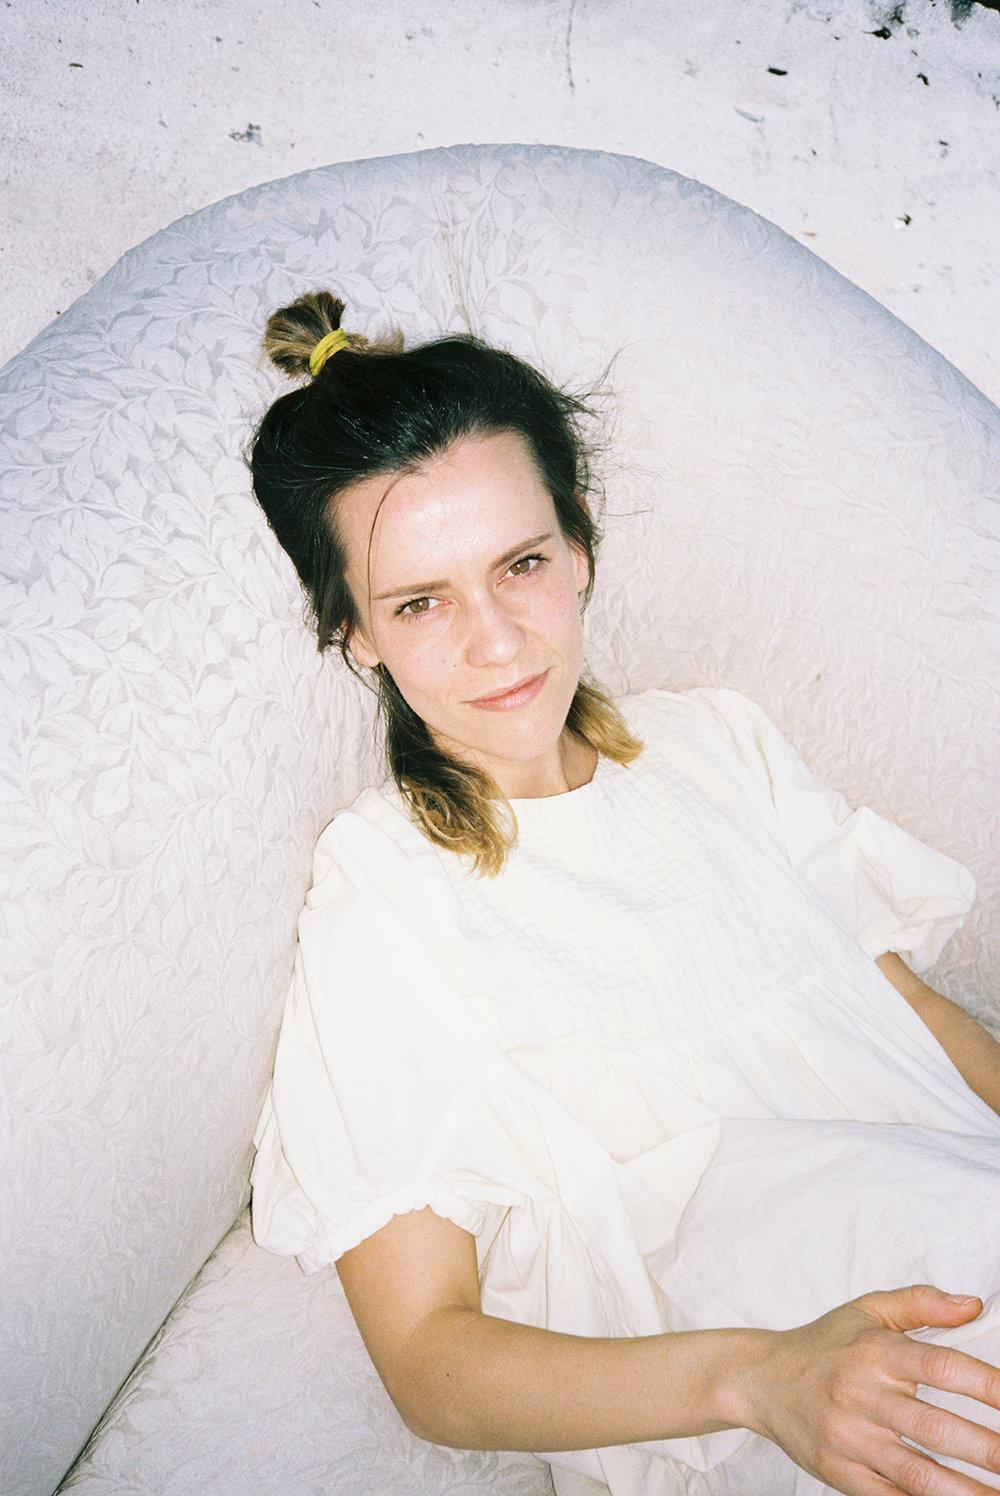 Natalie_Natalie-R1-007-2.jpg